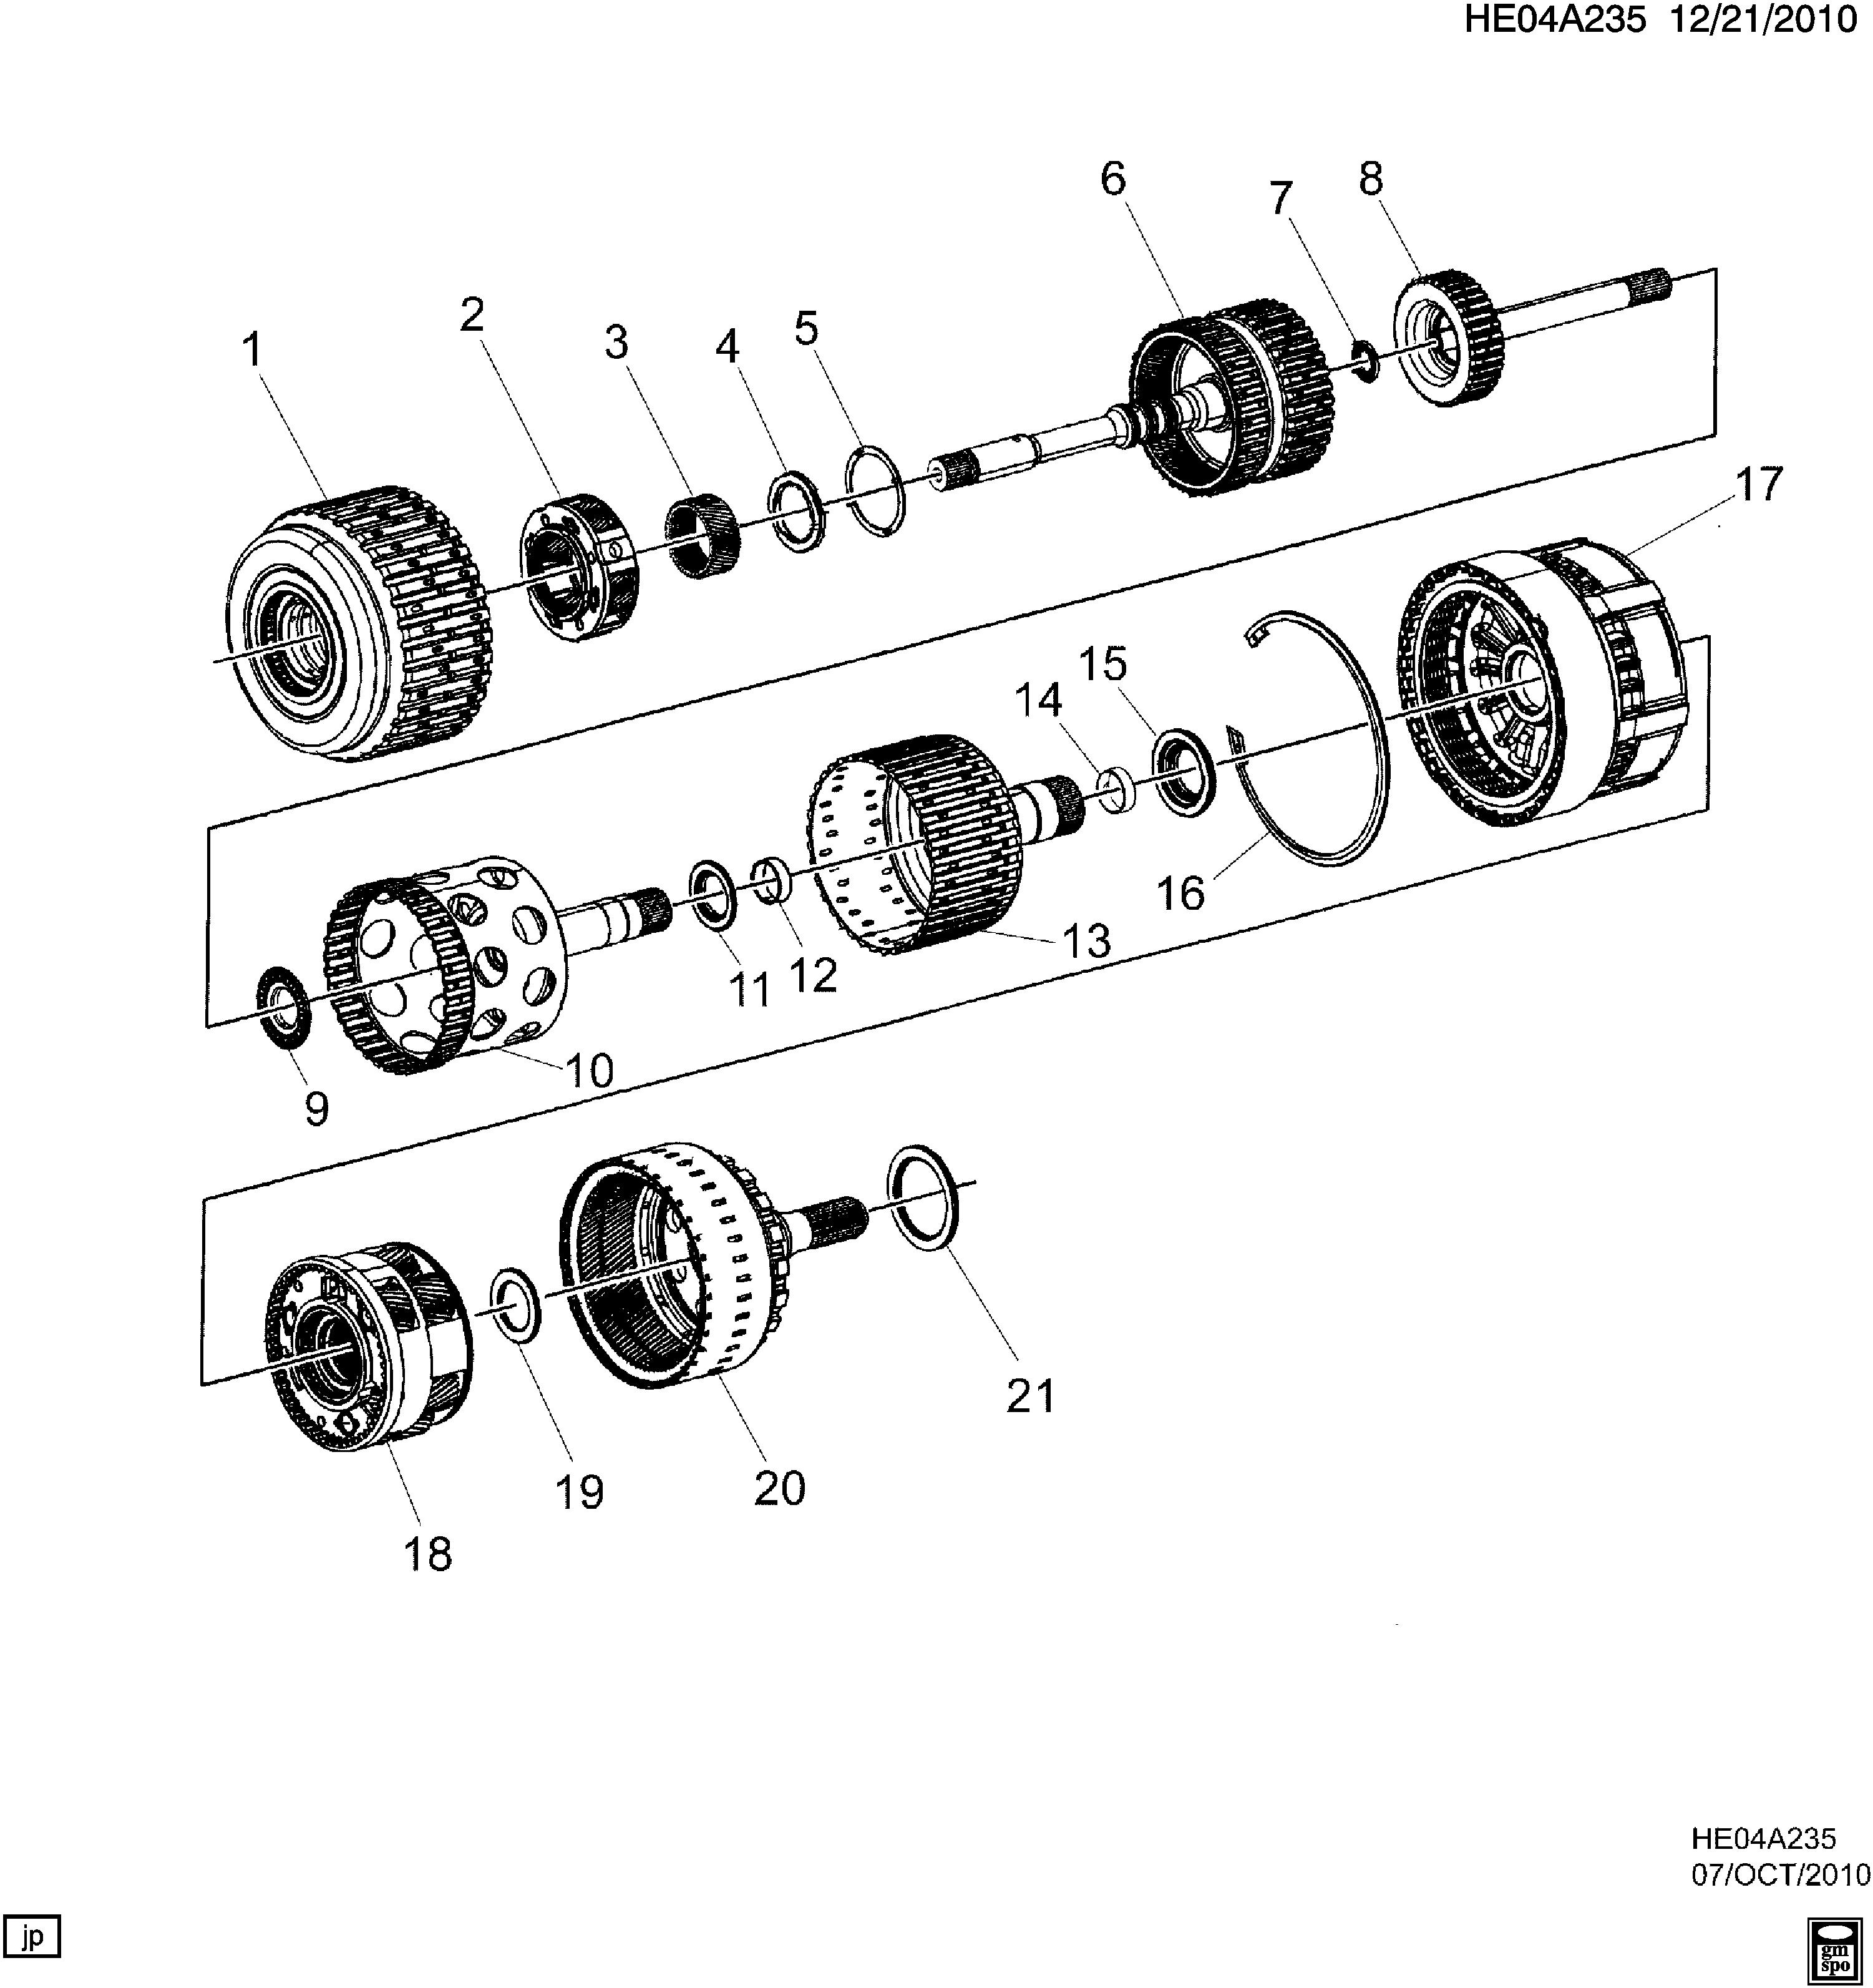 Pontiac G8 - E AUTOMATIC TRANSMISSION (MYC) (6L80) CLUTCH